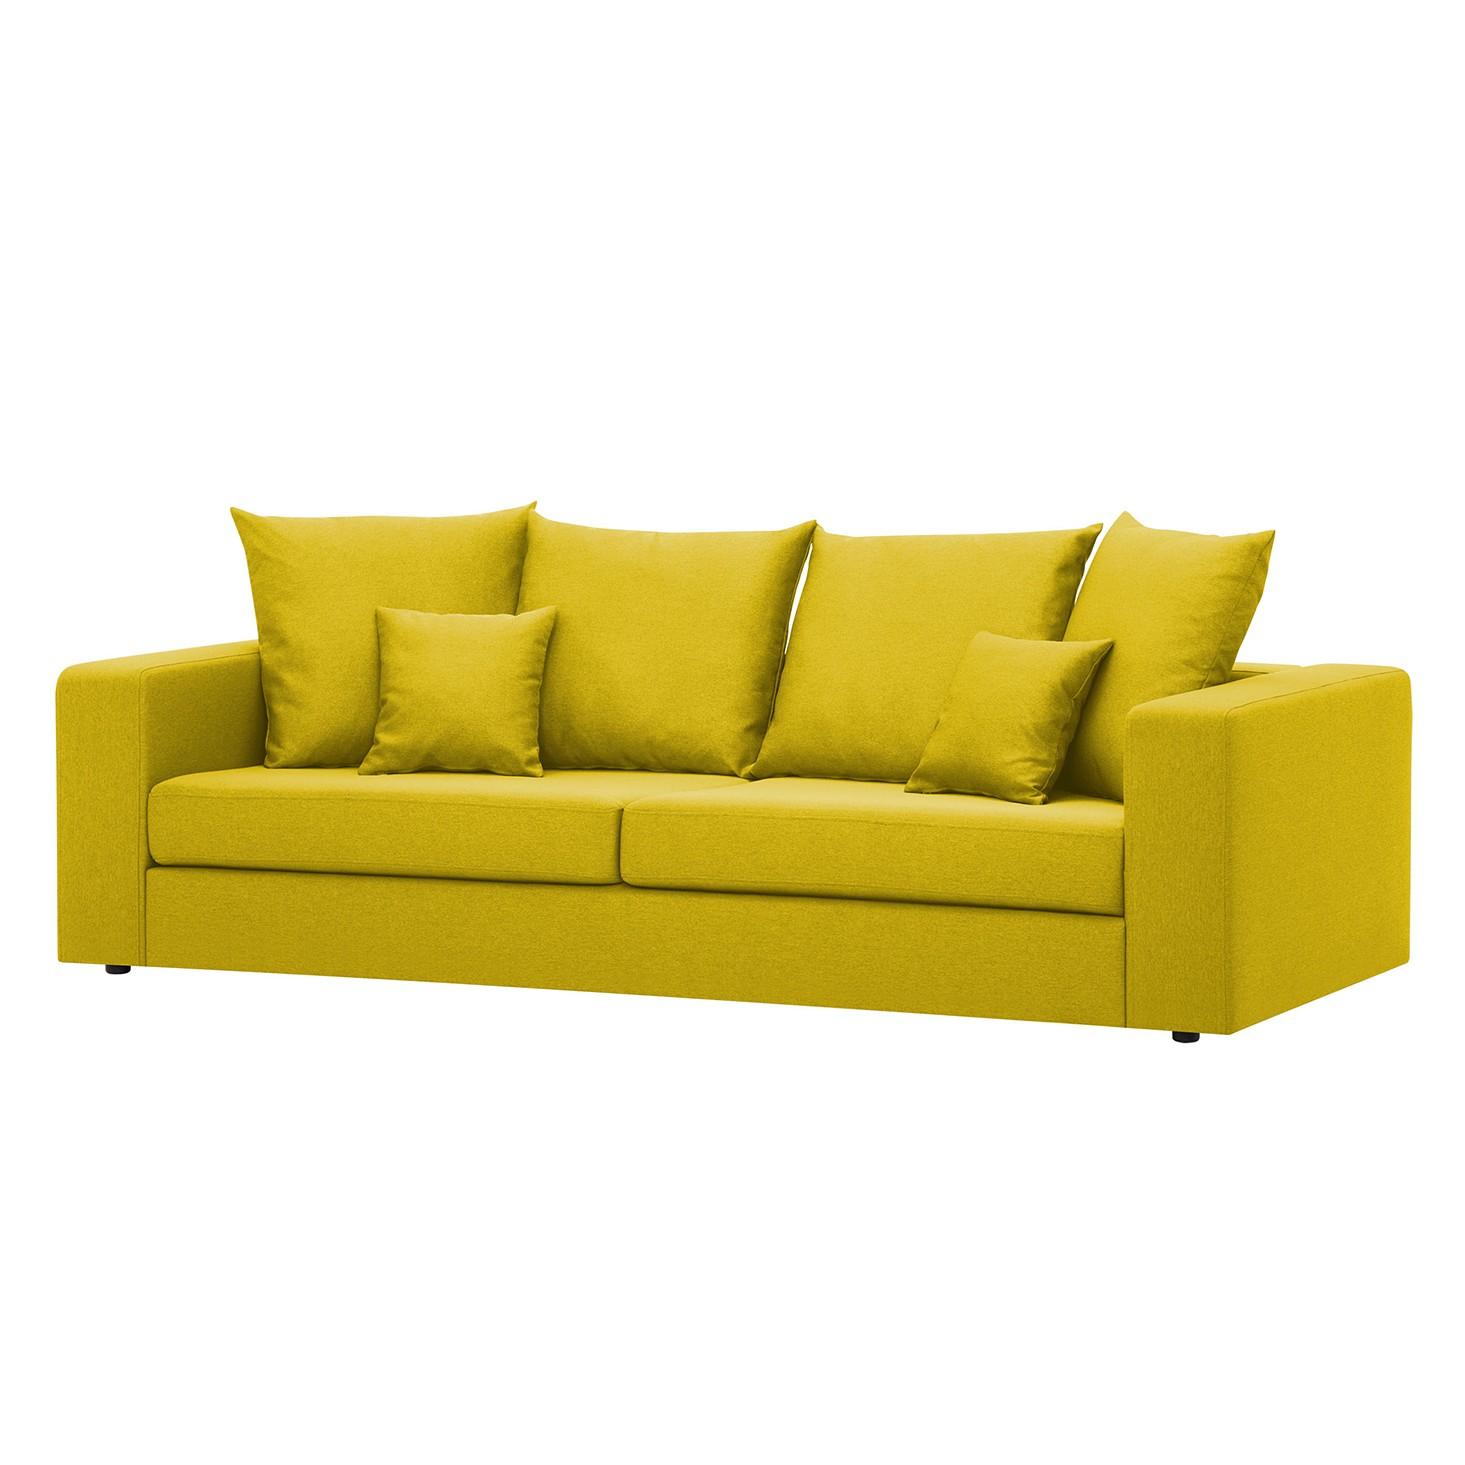 Sofa Bilbao (3-Sitzer) - Webstoff - Stoff Milan Gelb, Fredriks